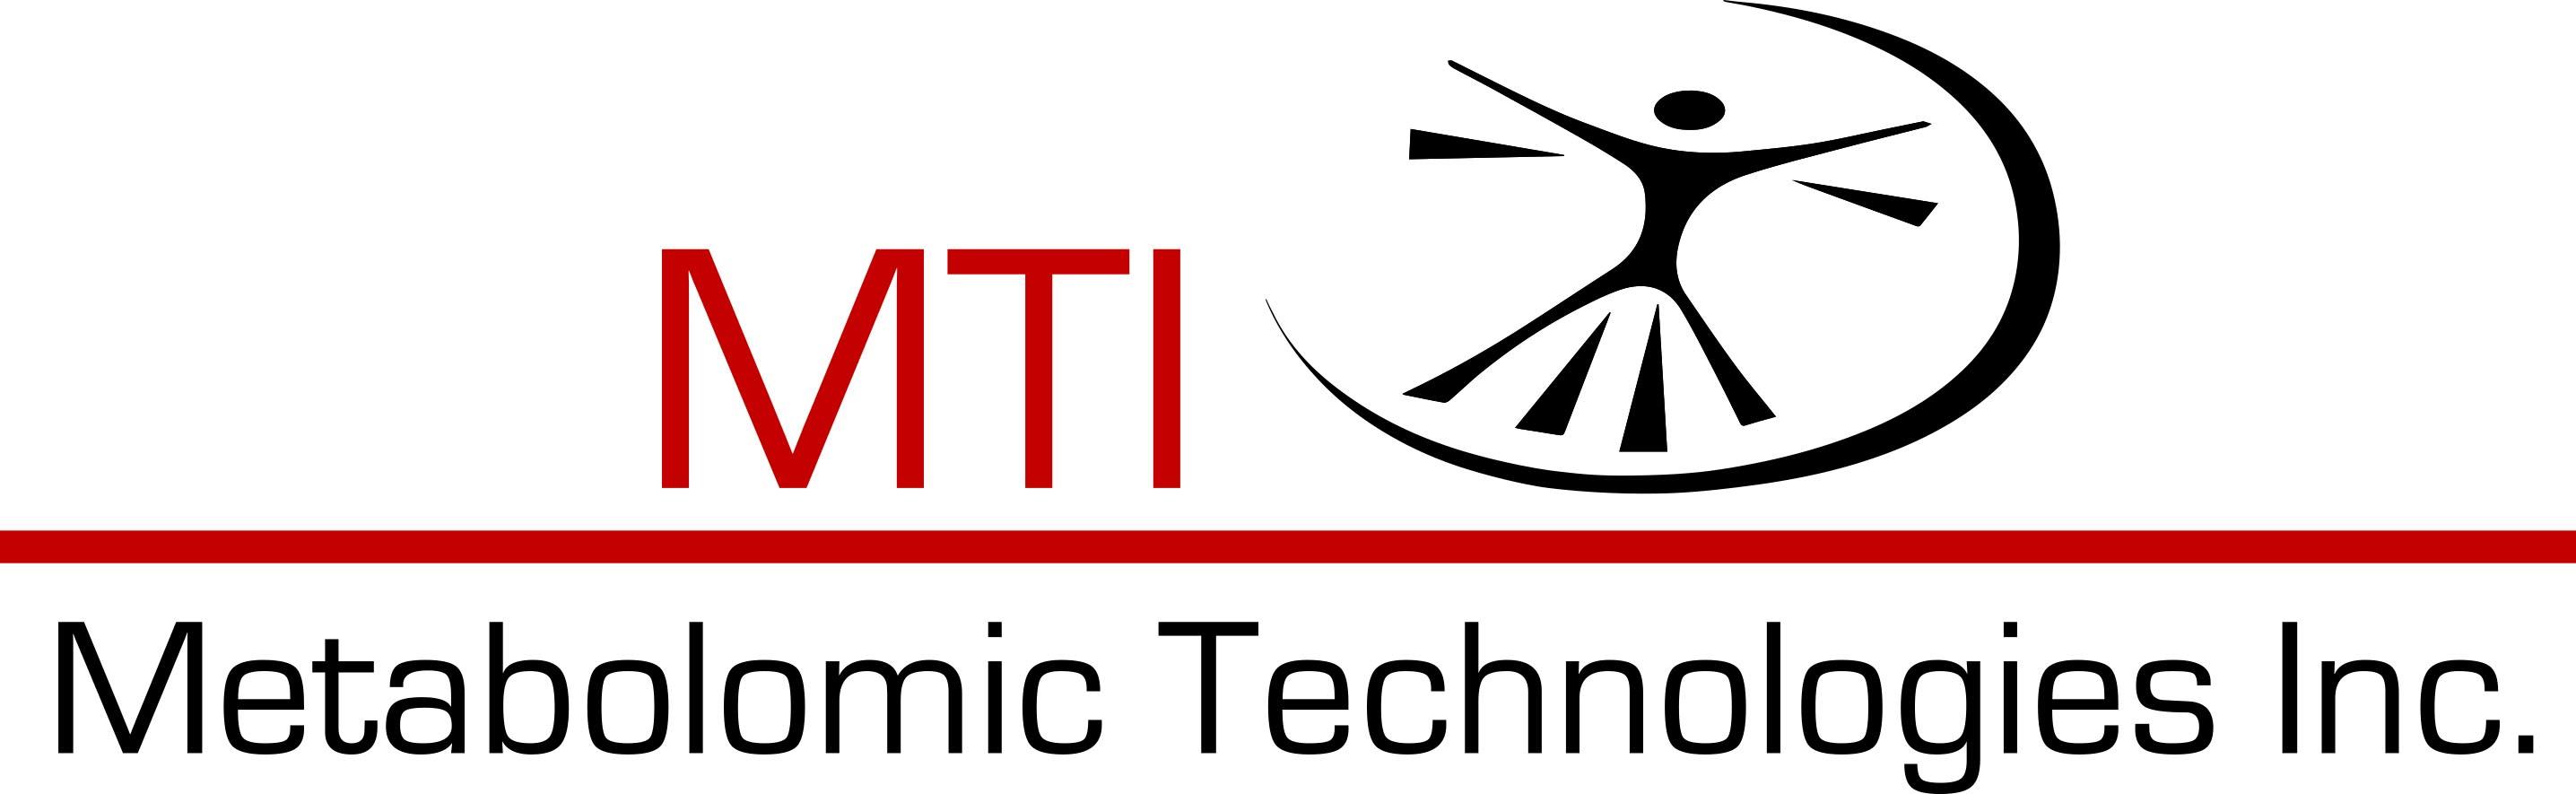 Metabolomic Technologies Inc. Logo